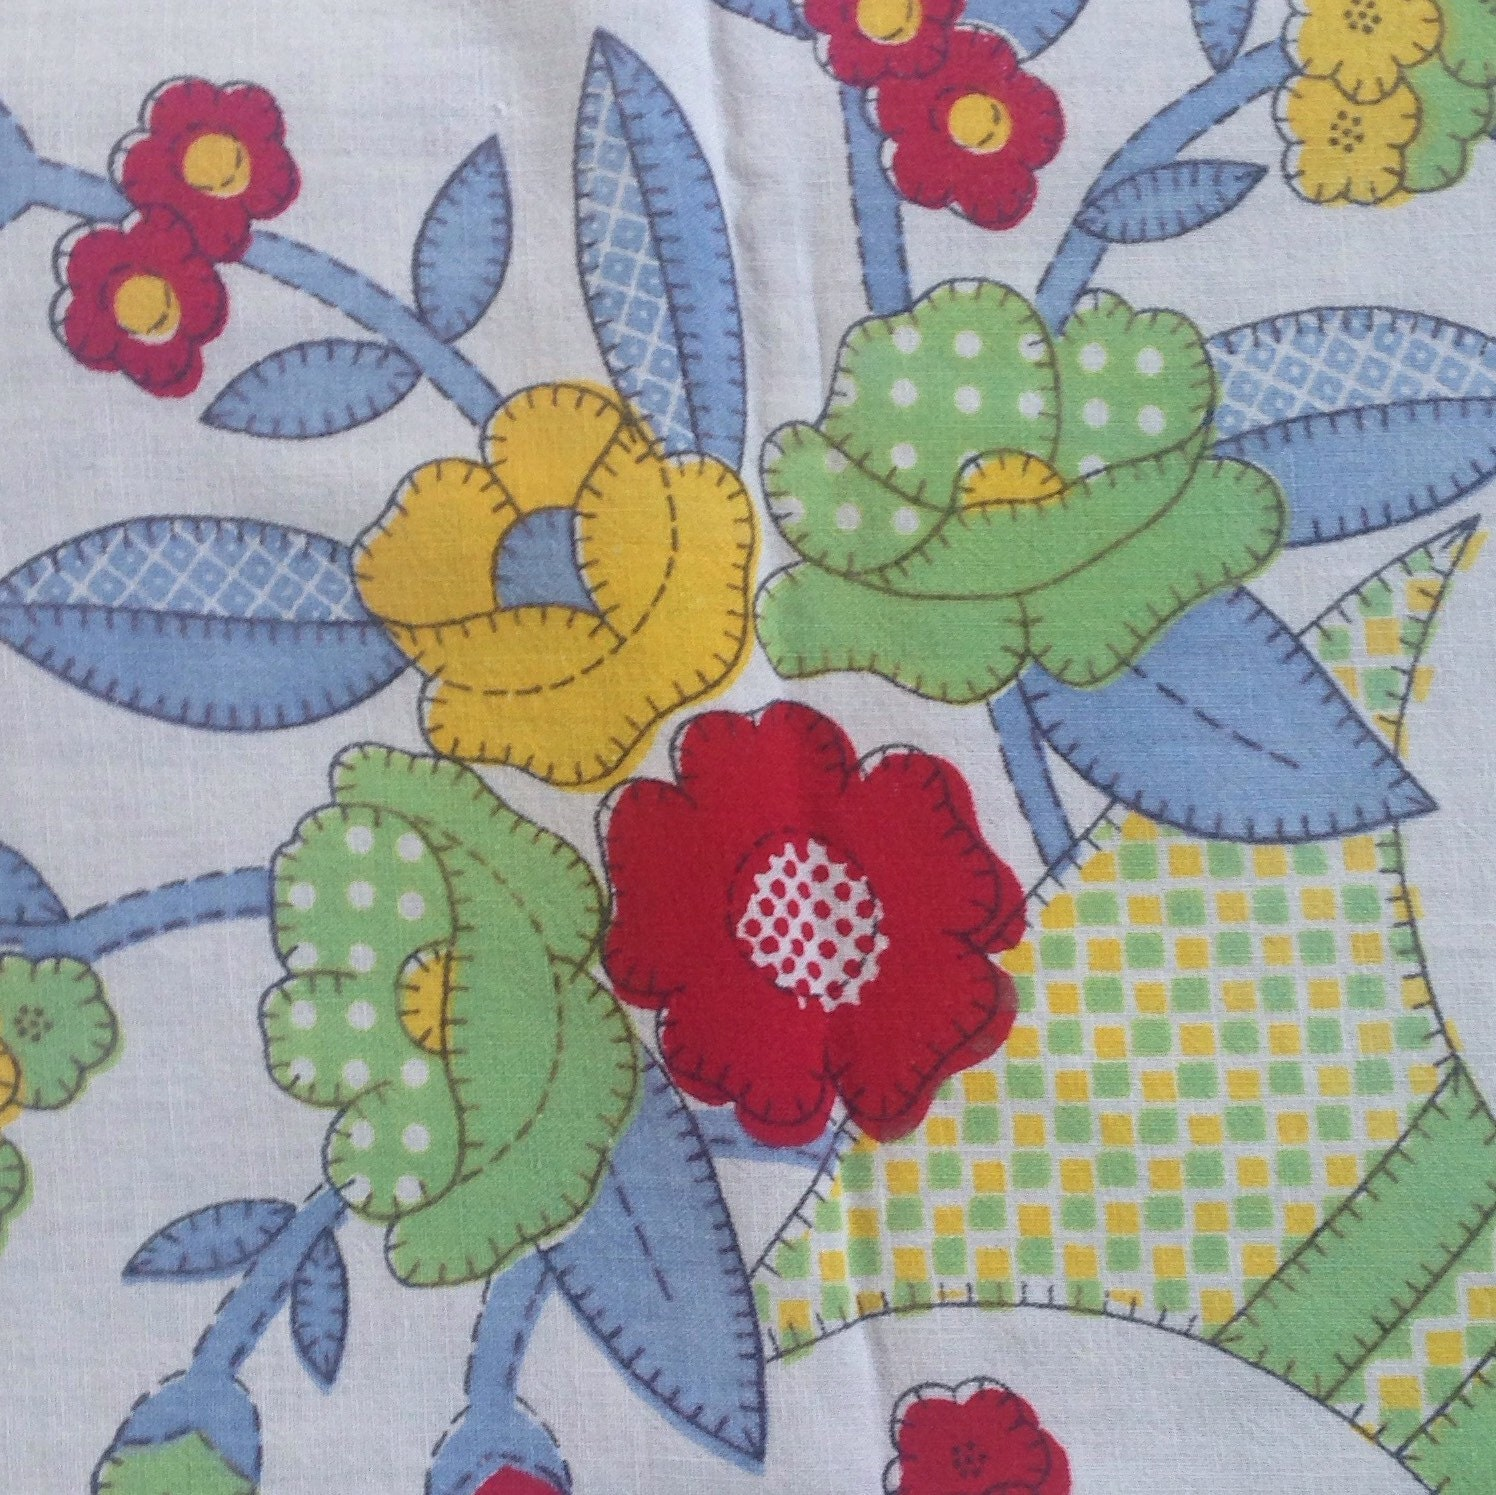 Applique designs for tablecloth - Applique Designs For Tablecloth